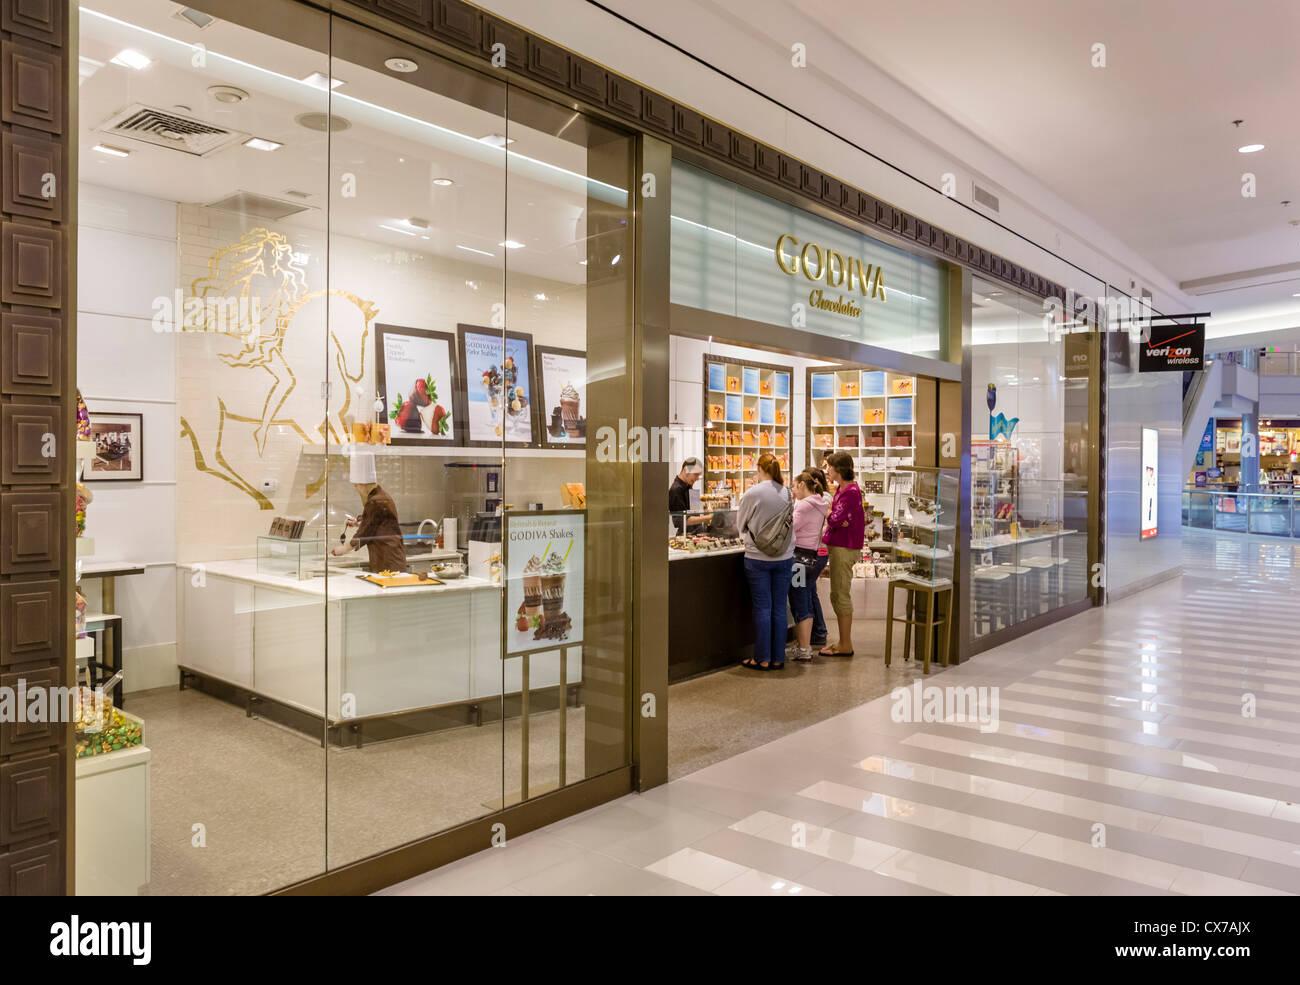 Godiva Chocolatier store in the Mall of America, Bloomington Stock ...